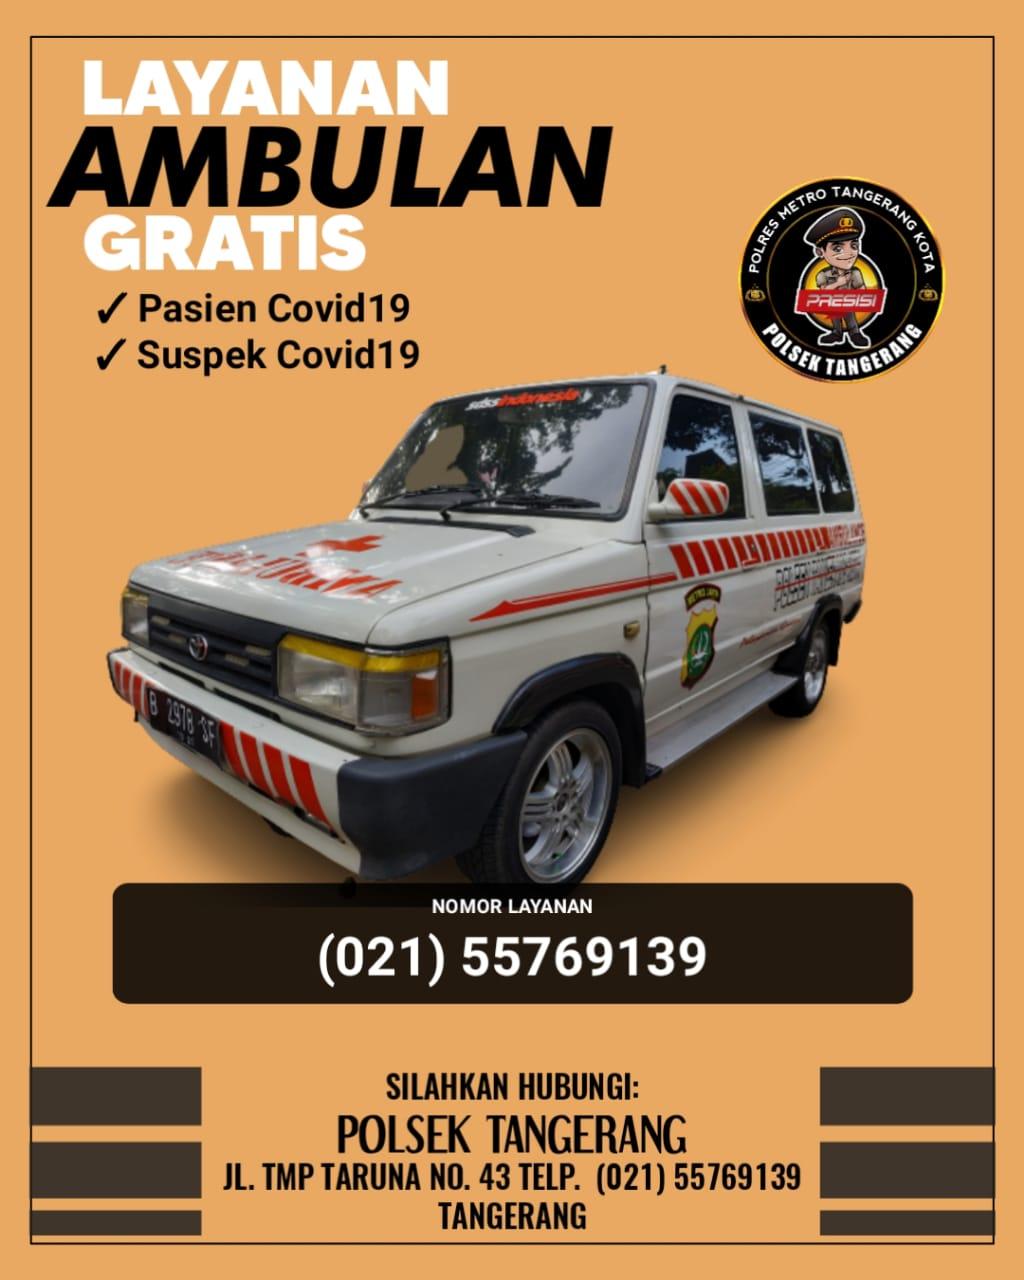 Ambulans Gratis